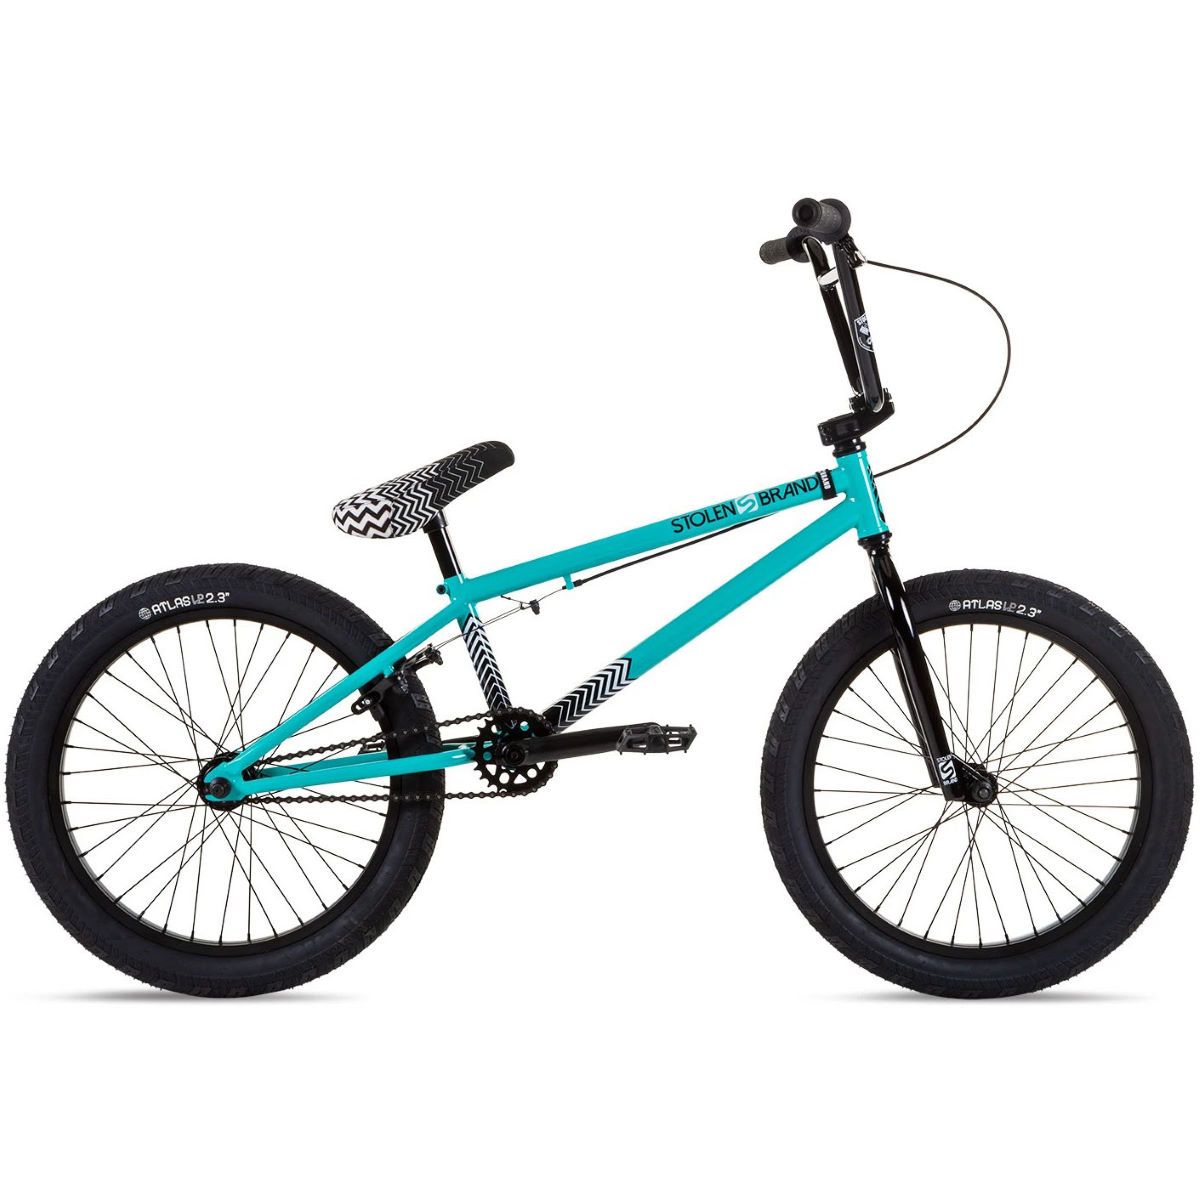 Stolen Compact 20 2021 Freestyle Bikes